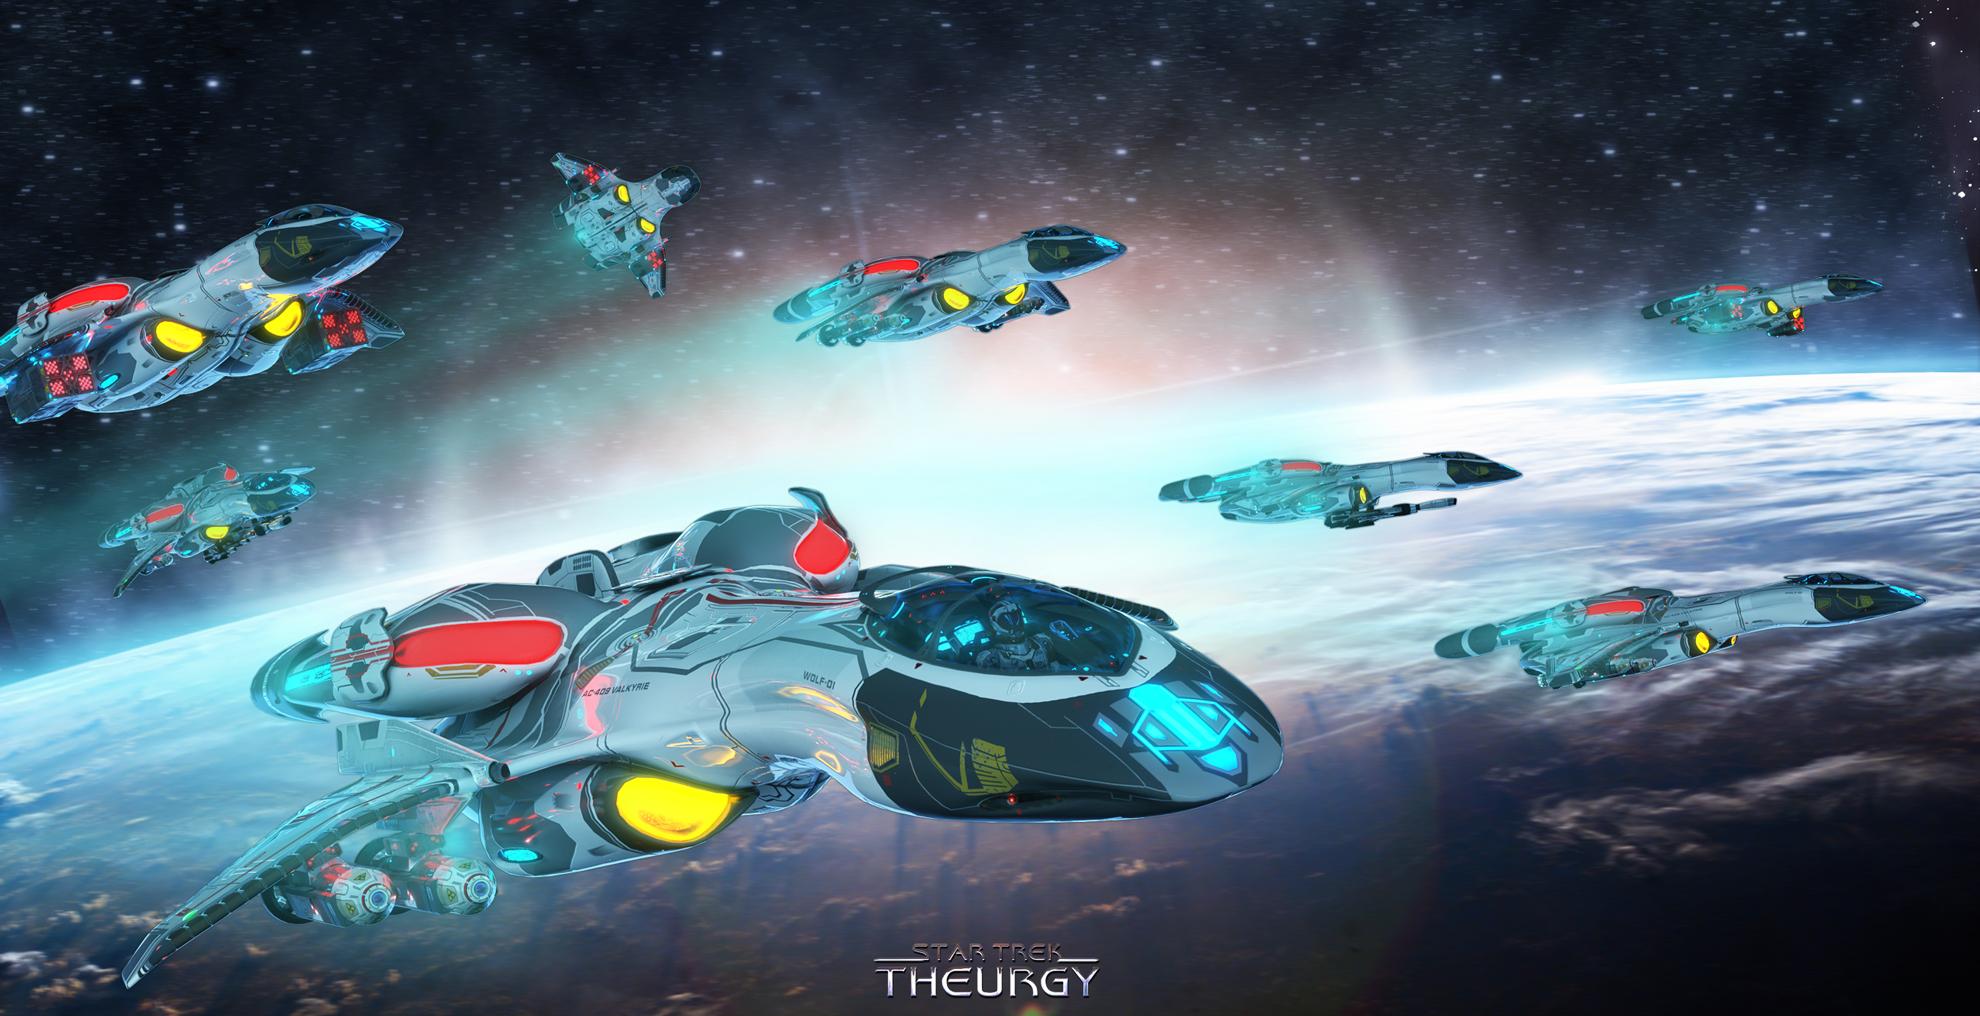 Theurgy Class Federation Starship Fan Trek The Omega Sector Bbs